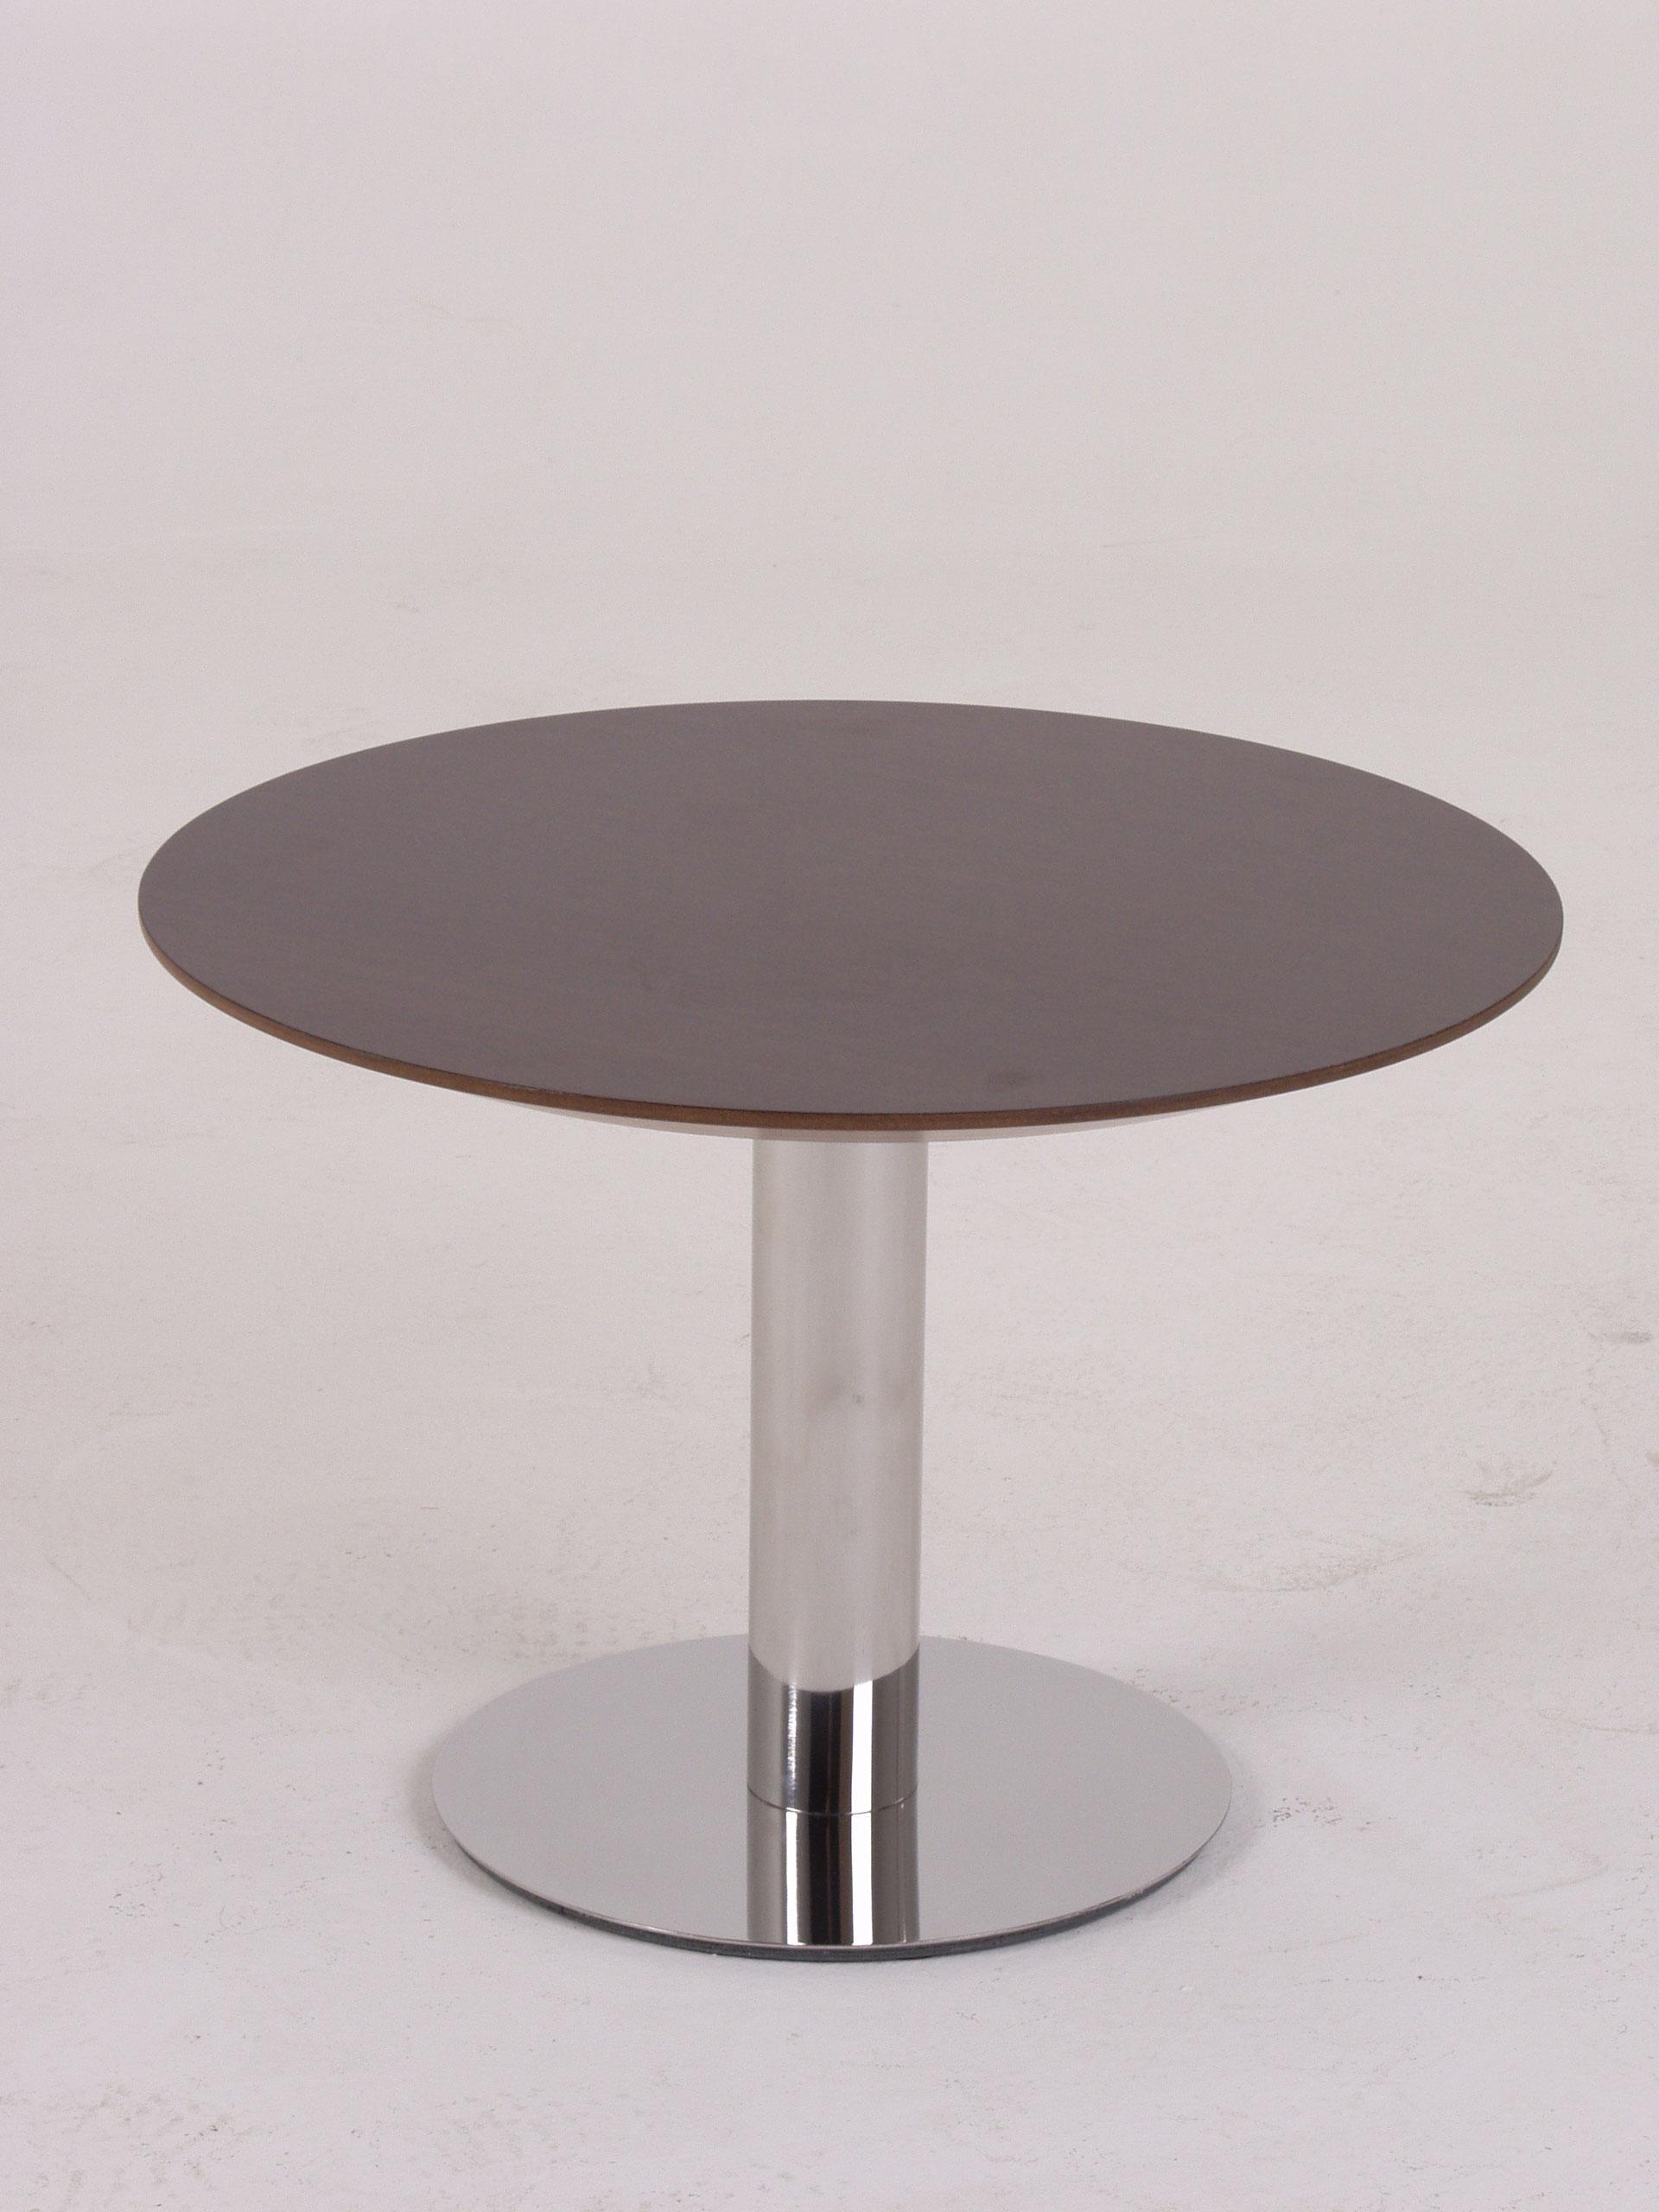 TABLE BASSE PRESTIGE BOIS